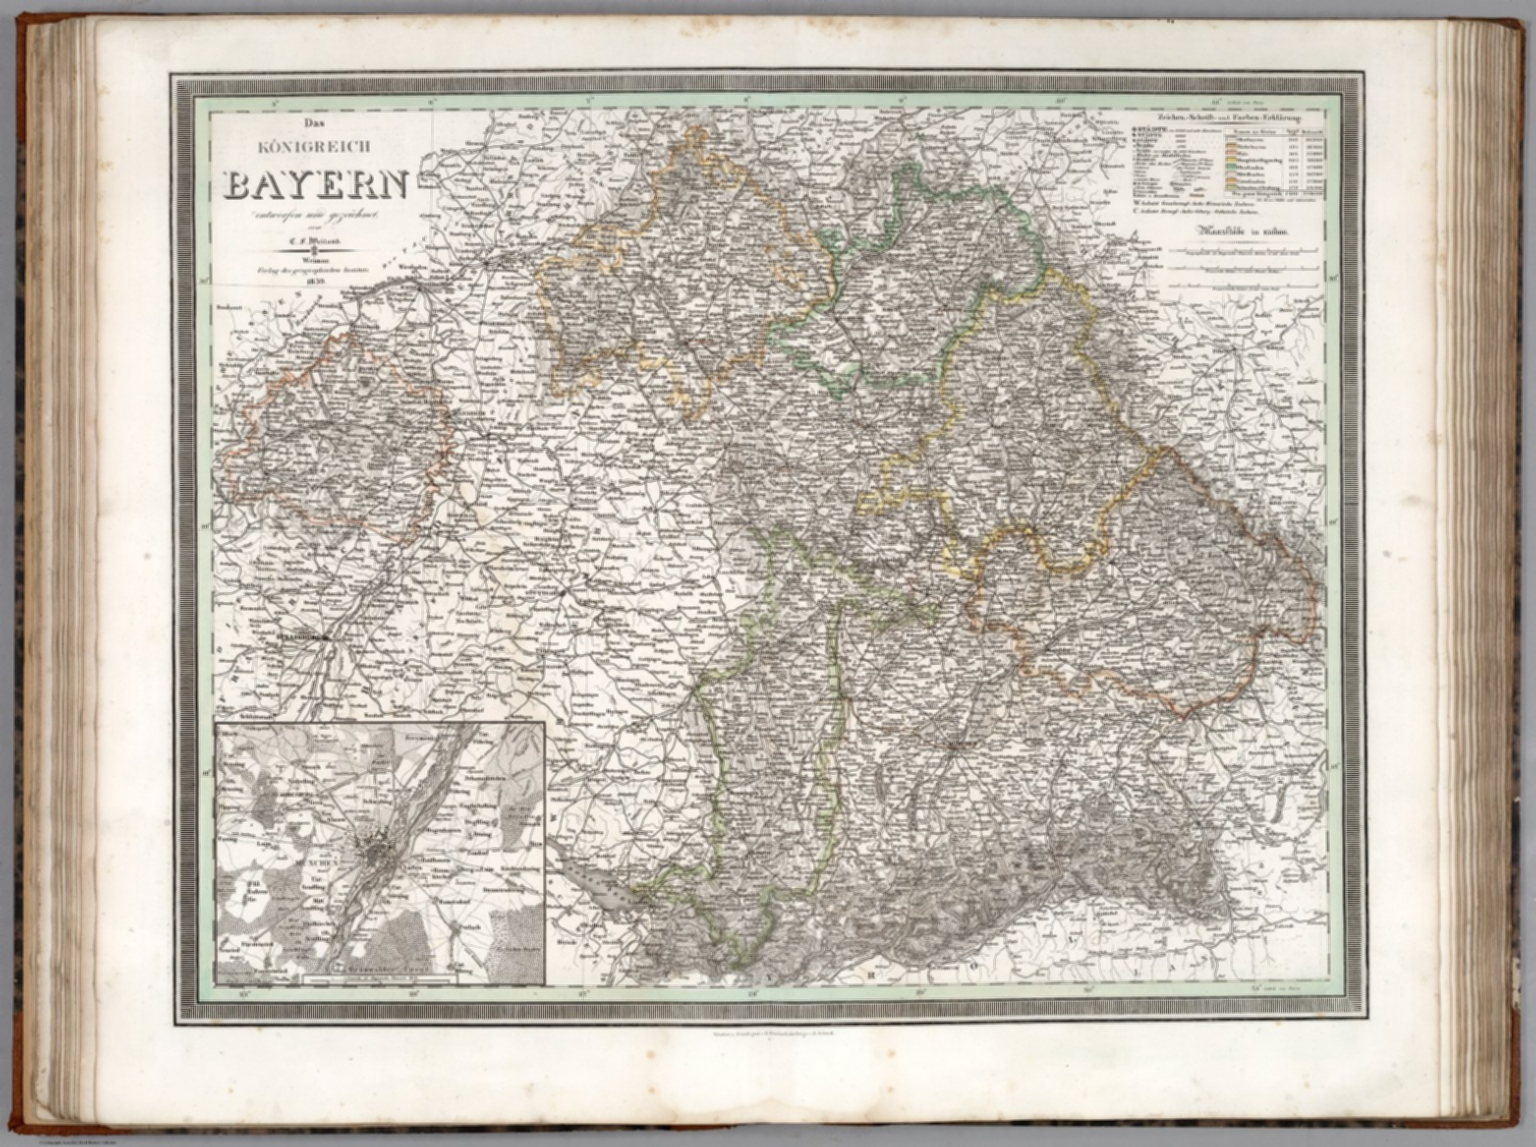 Kingdom Of Bavaria In Germany Map on rhine in germany map, poland in germany map, world war i in germany map, baden-württemberg in germany map, frankfurt in germany map, saxony in germany map, bremen in germany map, munich in germany map, cologne in germany map, hamburg in germany map, black forest in germany map, alps in germany map,